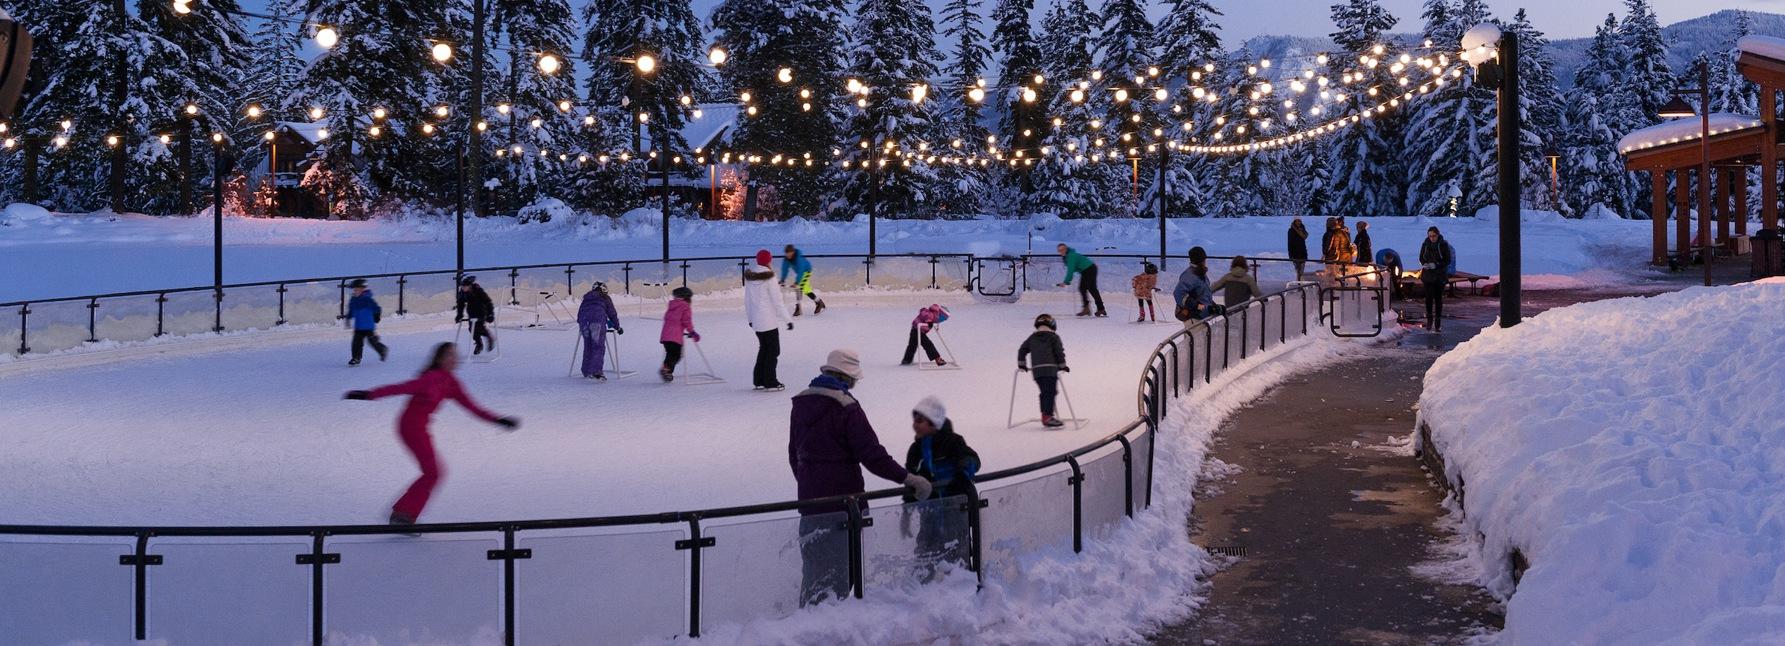 suncadia_activities_winter_iceskating_night